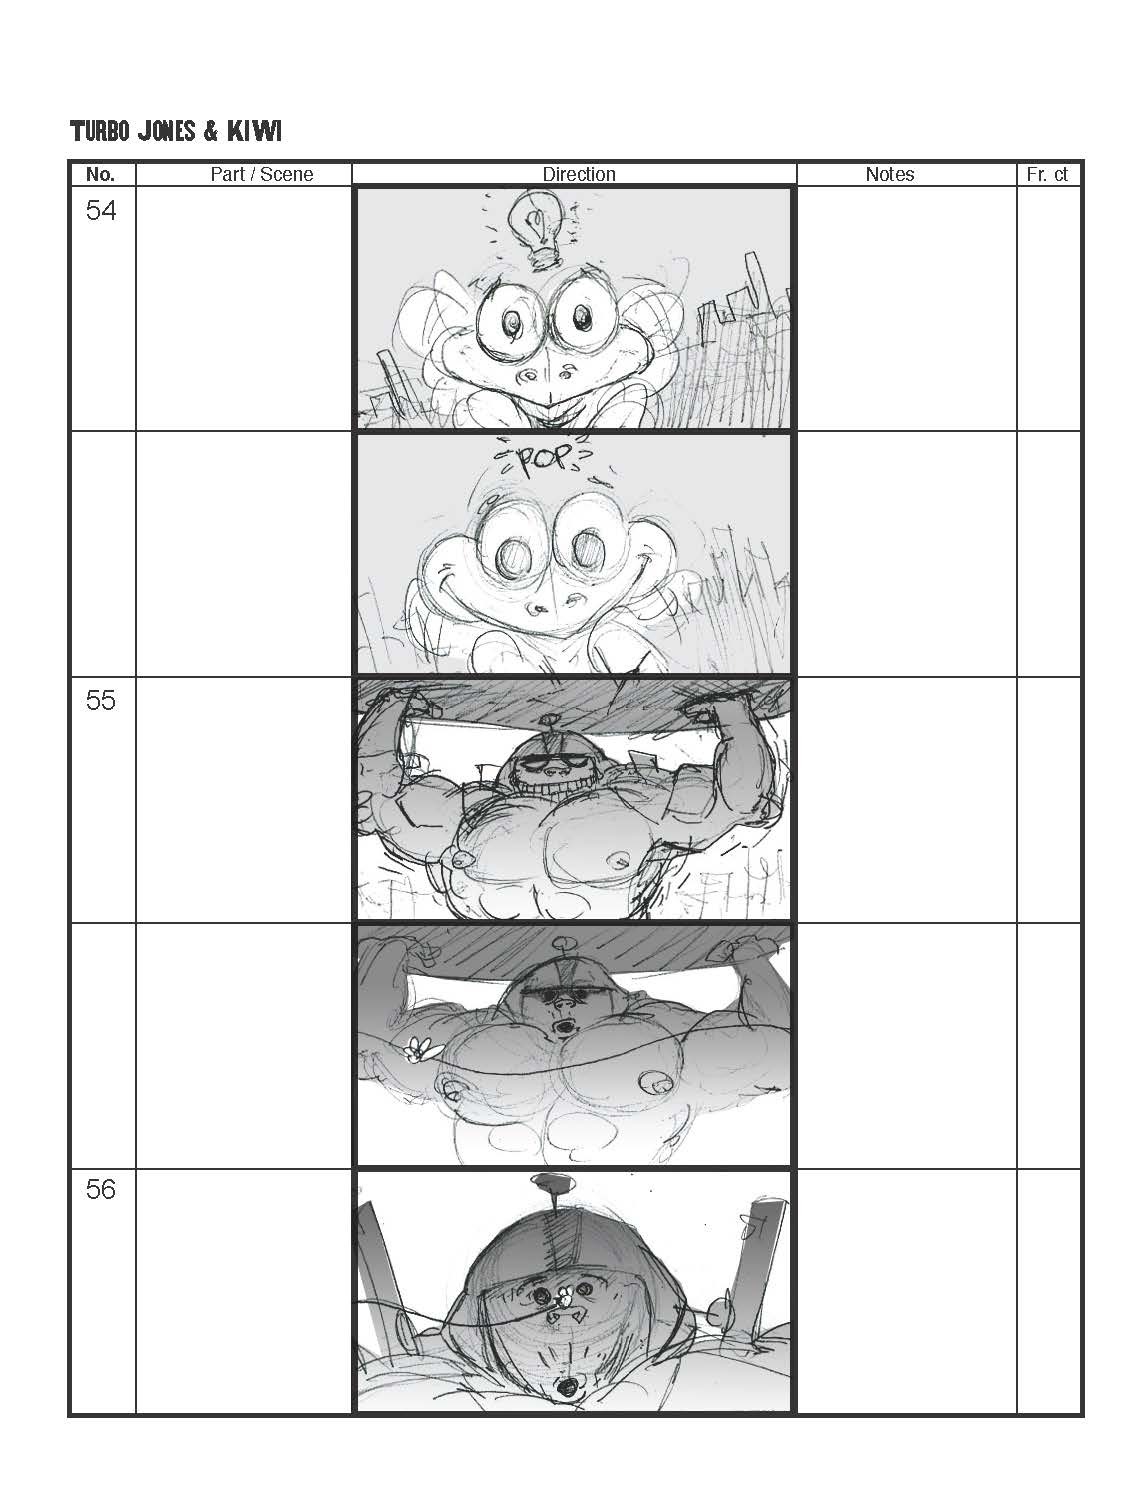 TJK_Storyboards_v01_HIGH_Page_28.jpg